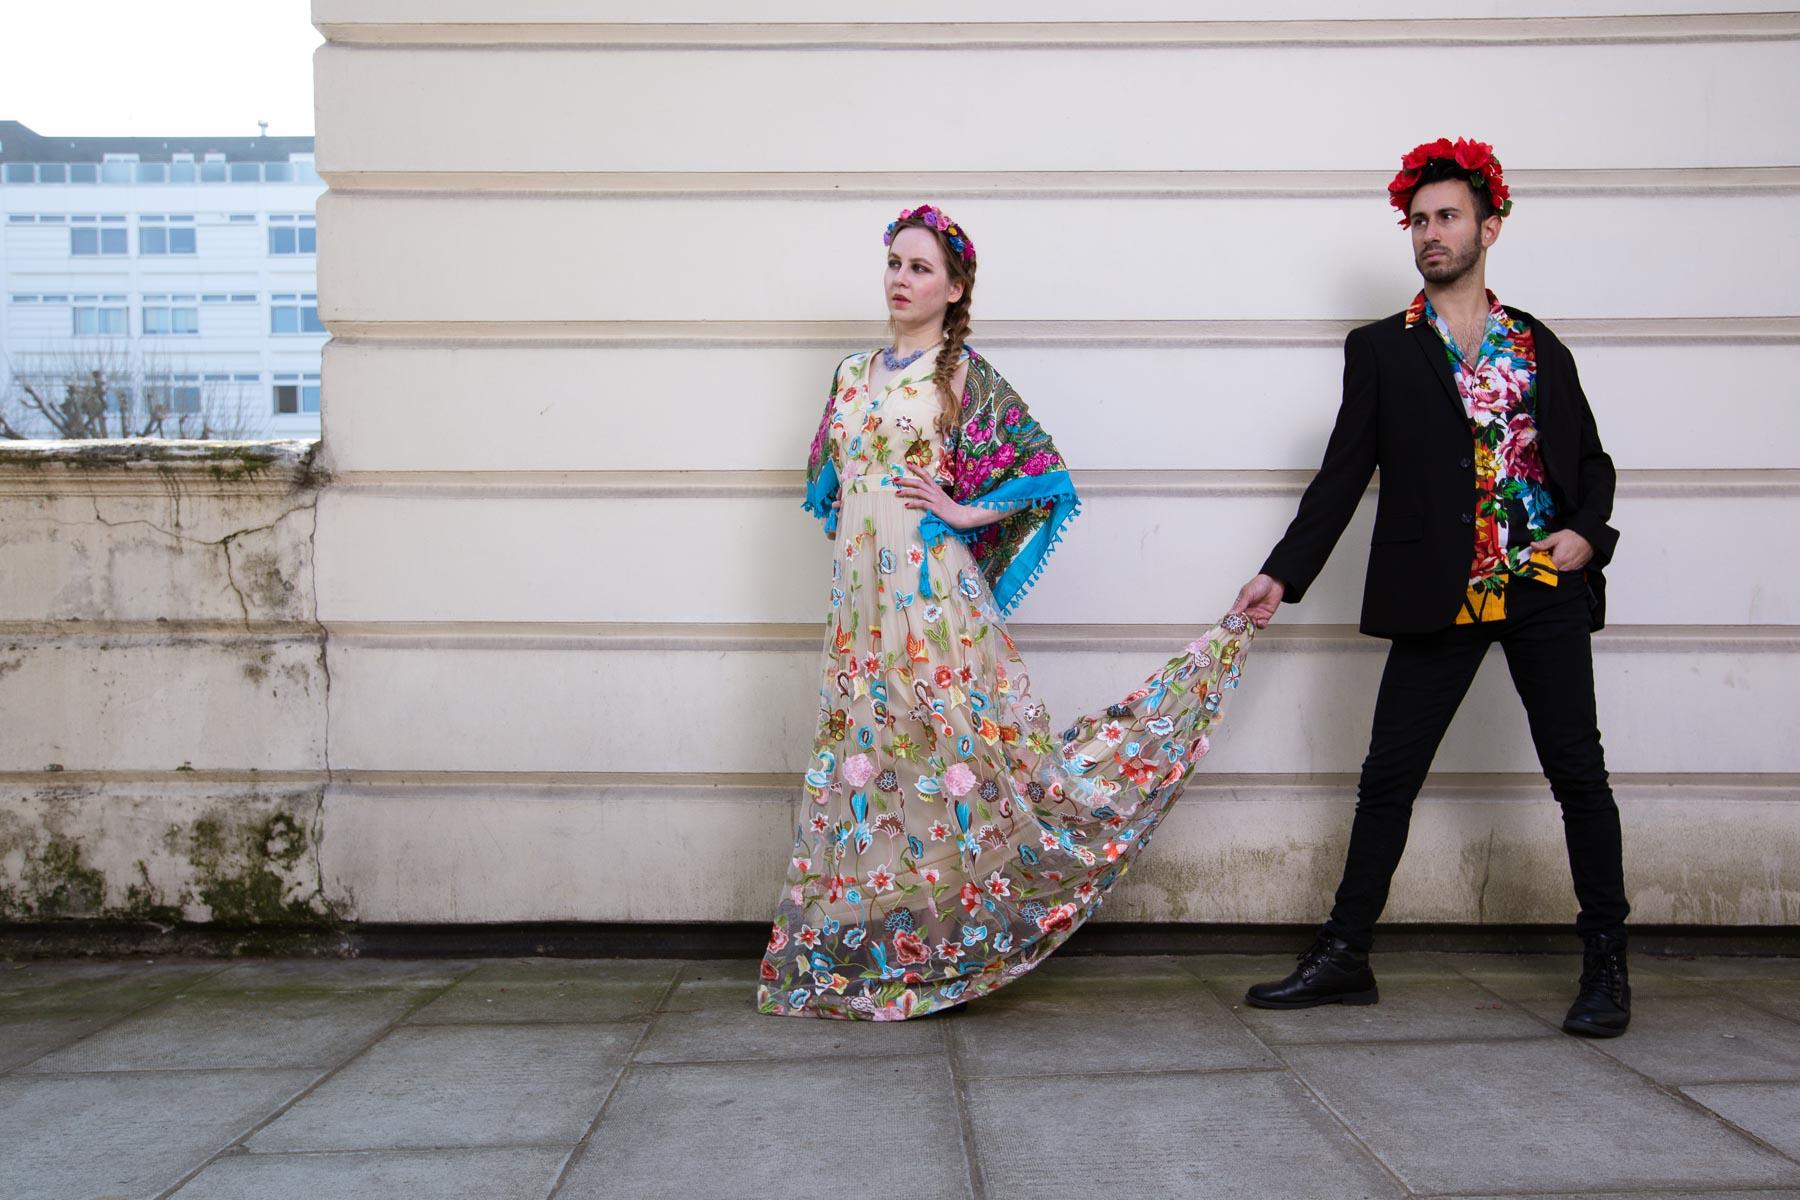 Russian-style-fashion-photographer-london-floral-Русский-стиль-мода-павловопосадский-платок-natalia-smith-photography-0032.jpg